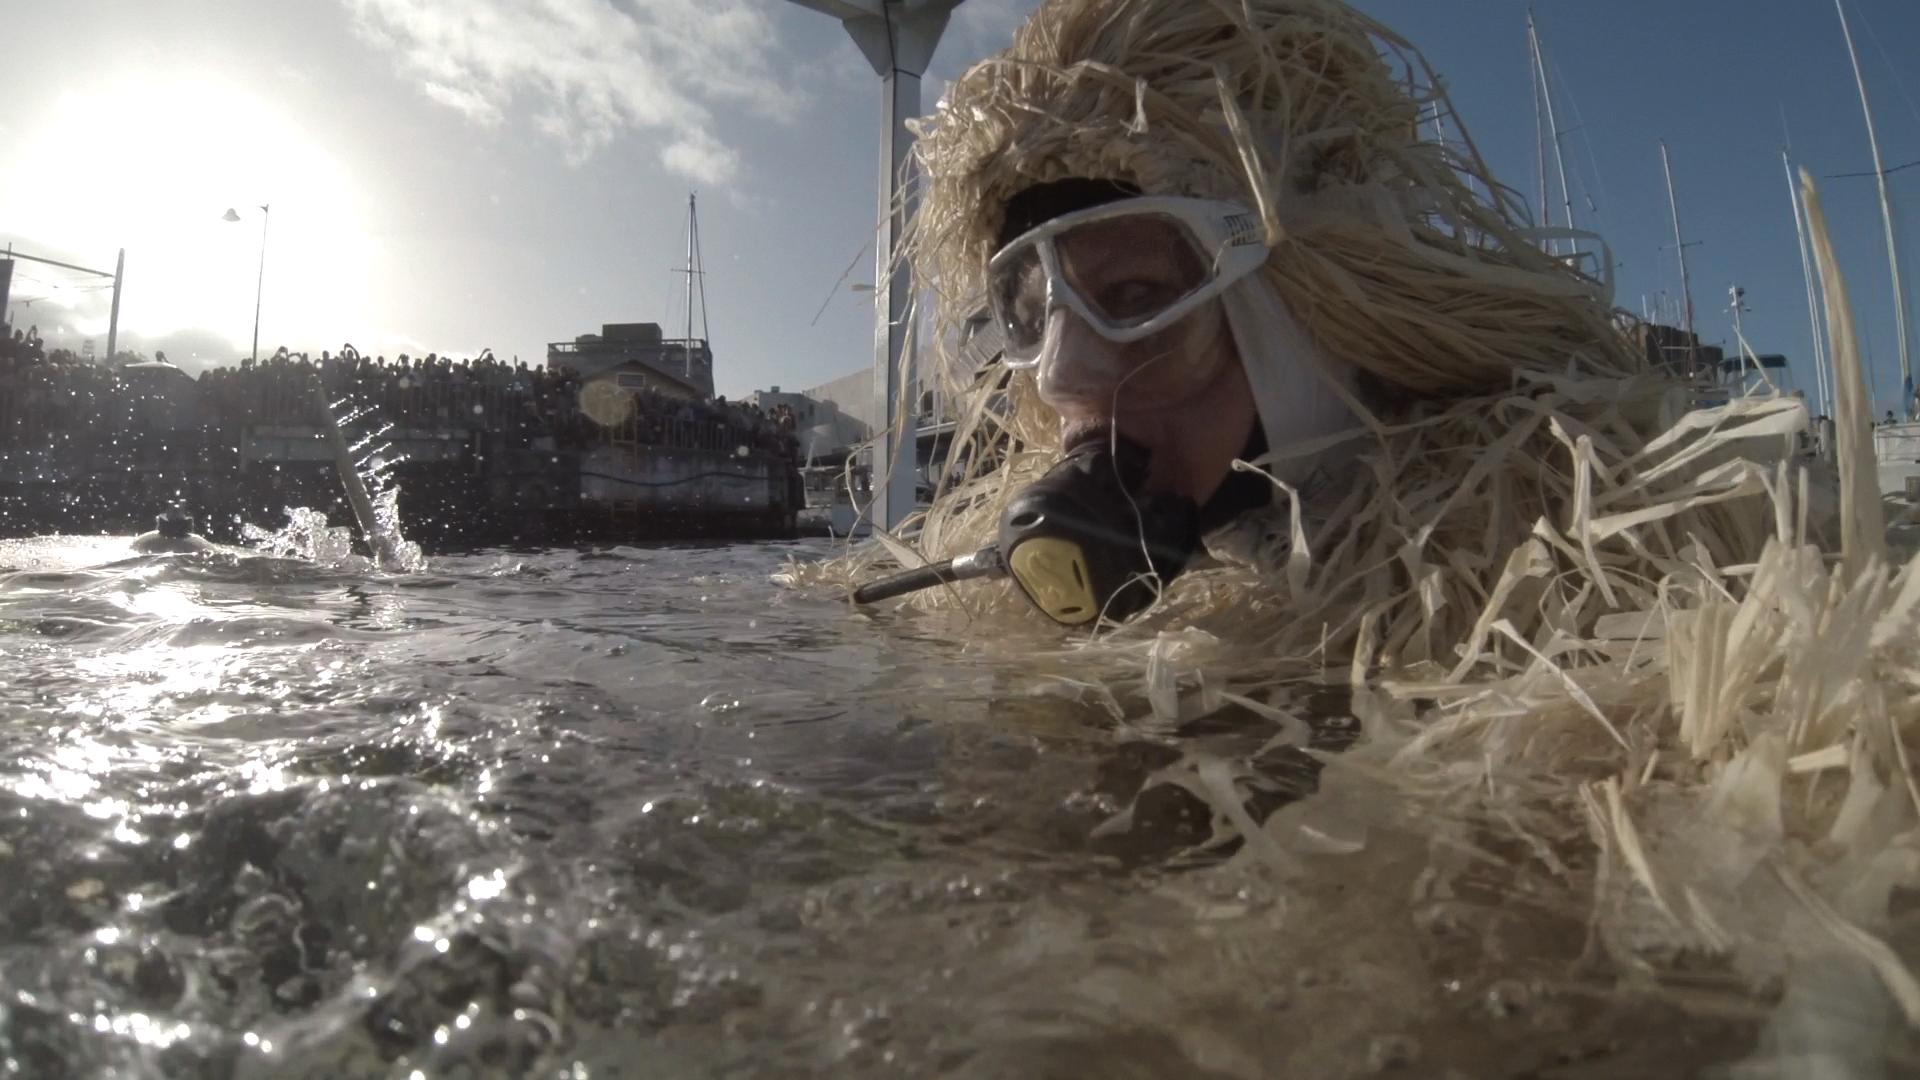 HD Video Still 'Submerge' footage, MONA FOMA 2013